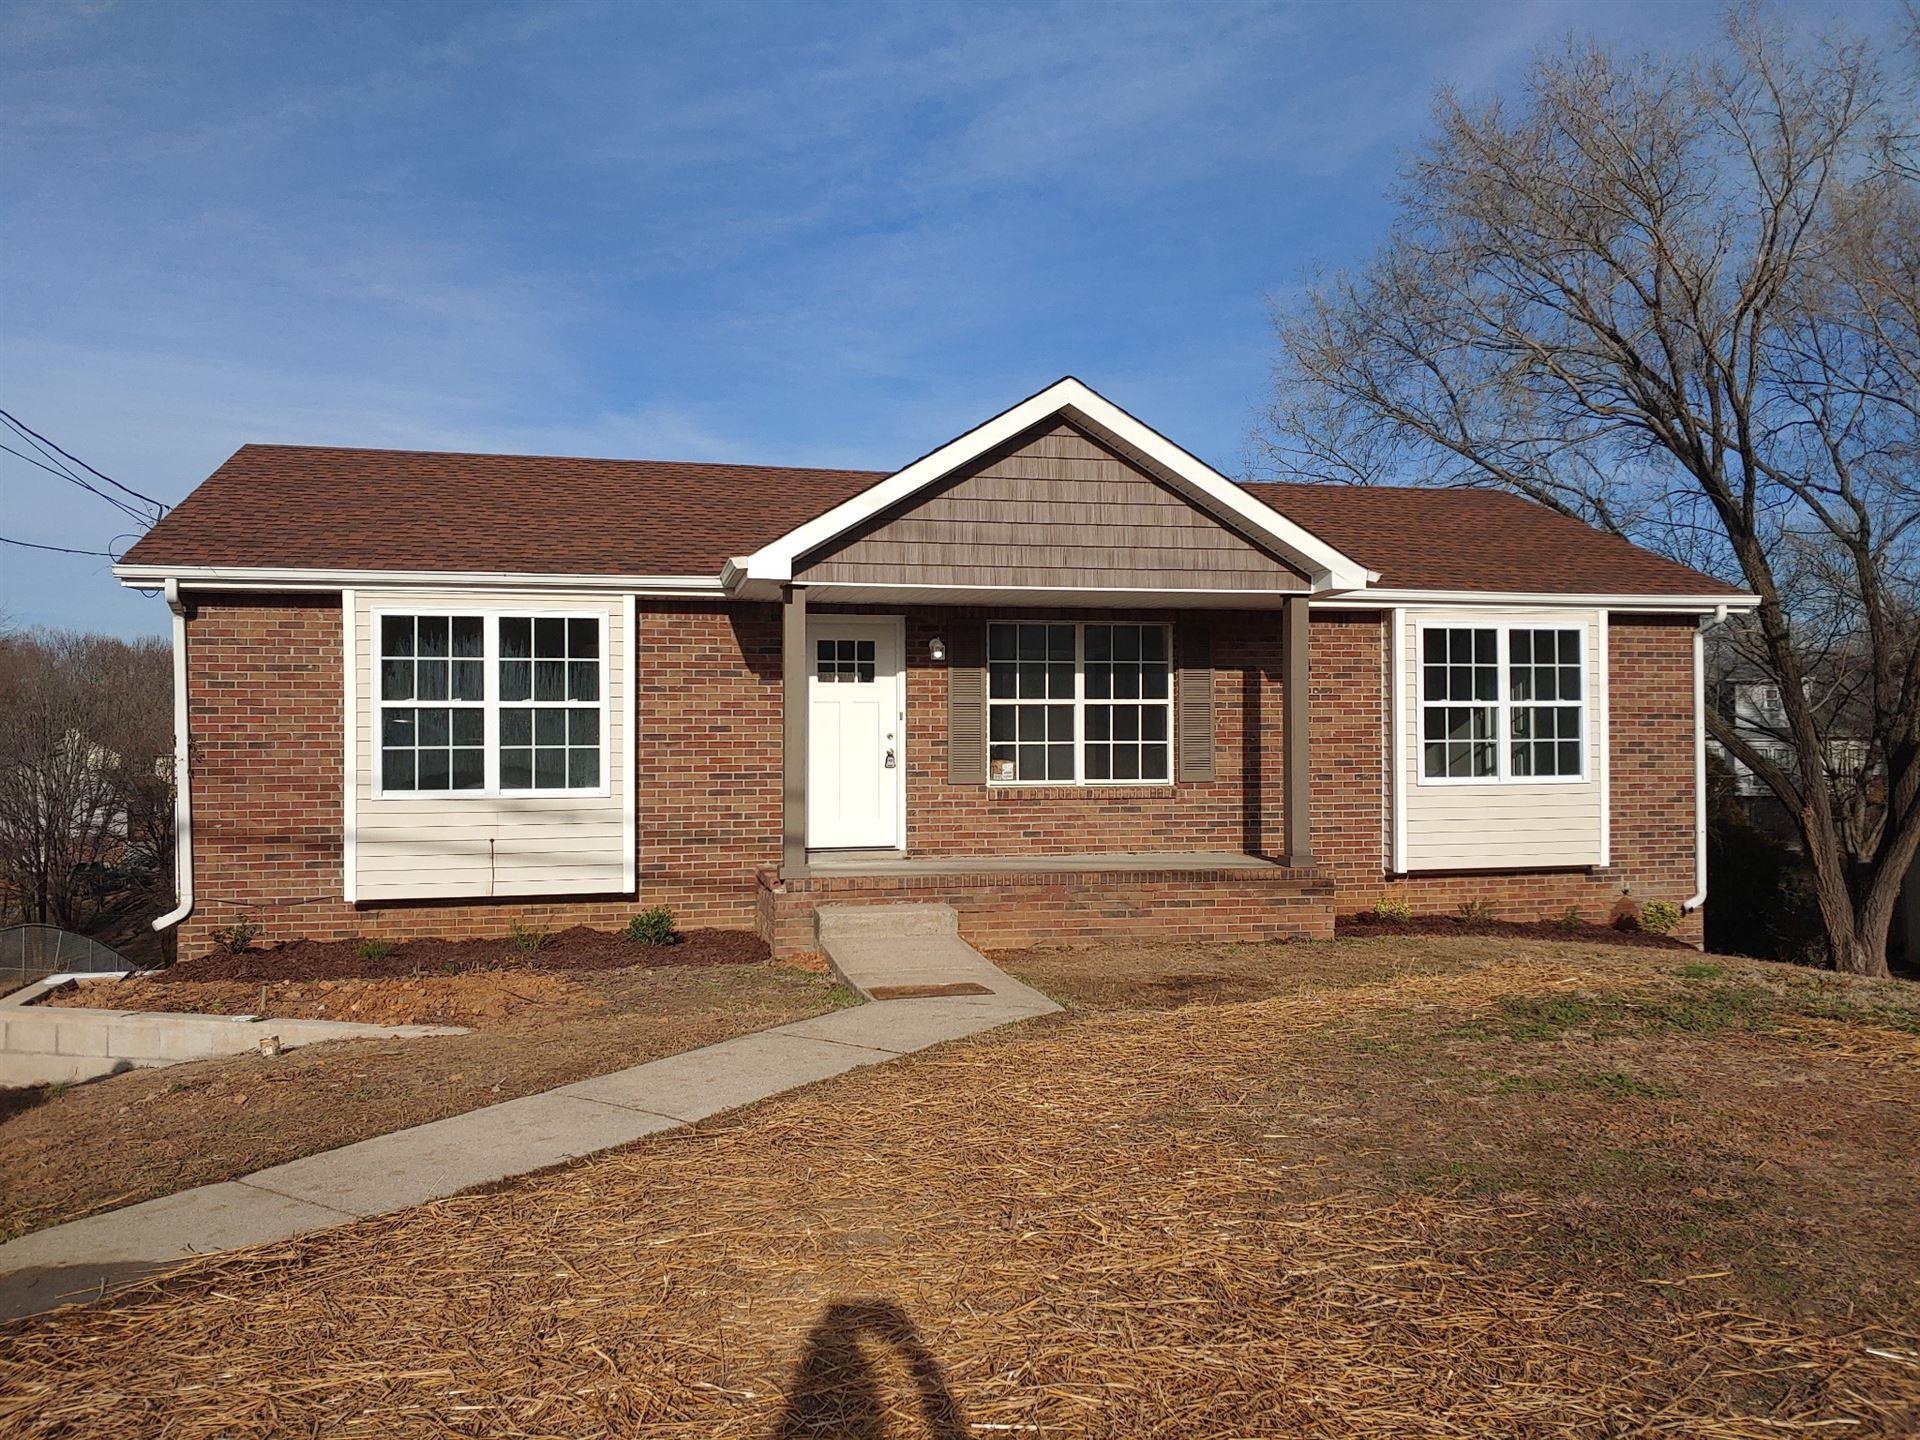 2133 Singletree Dr., Clarksville, TN 37040 - MLS#: 2220358